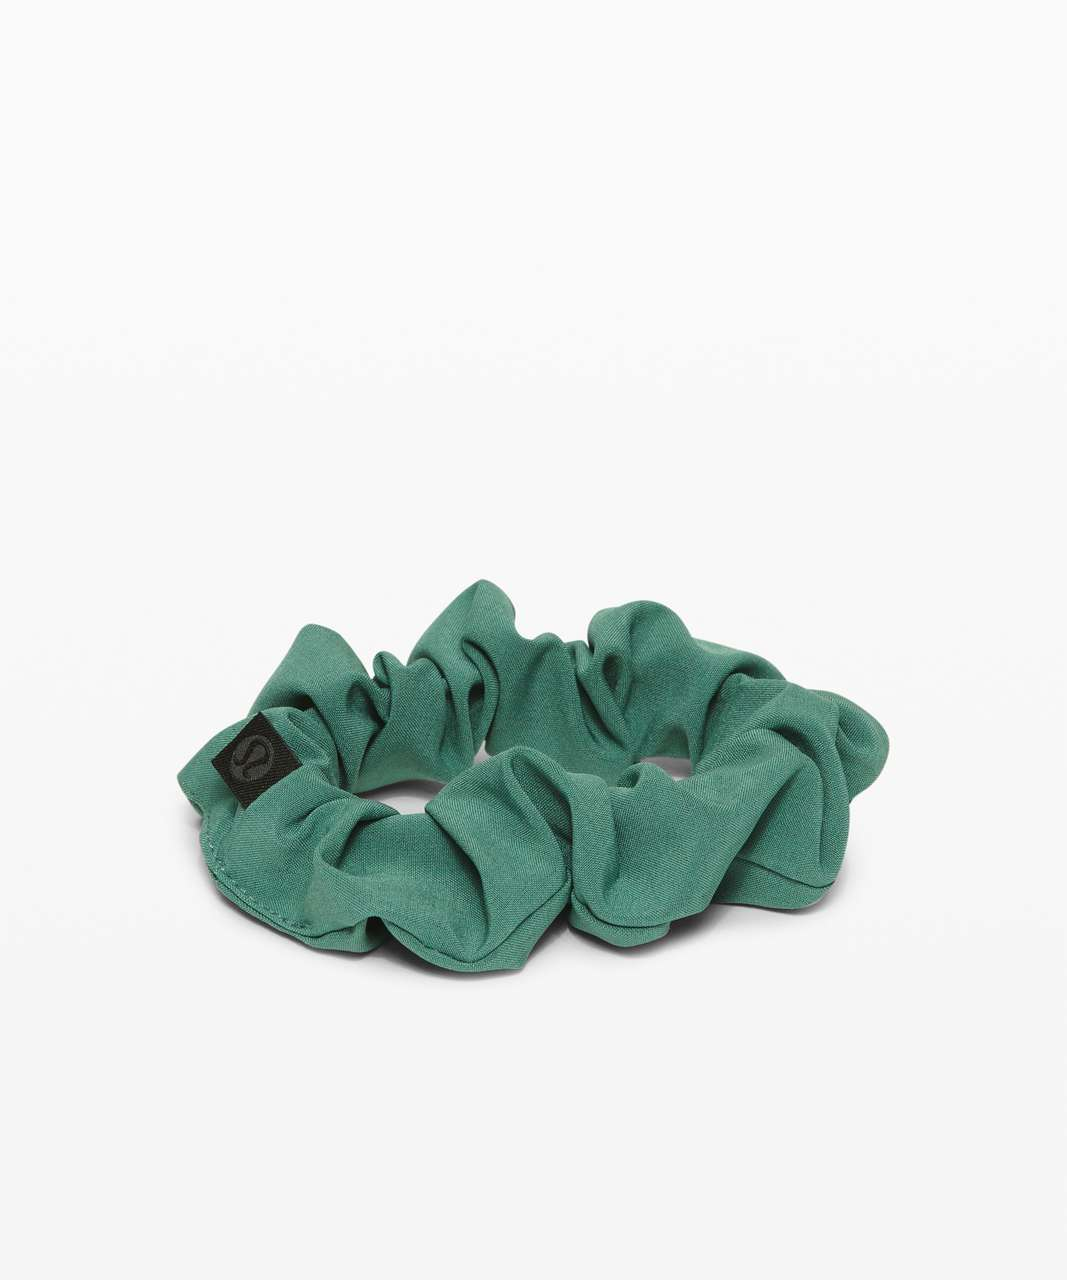 Lululemon Uplifting Scrunchie - Frosted Pine